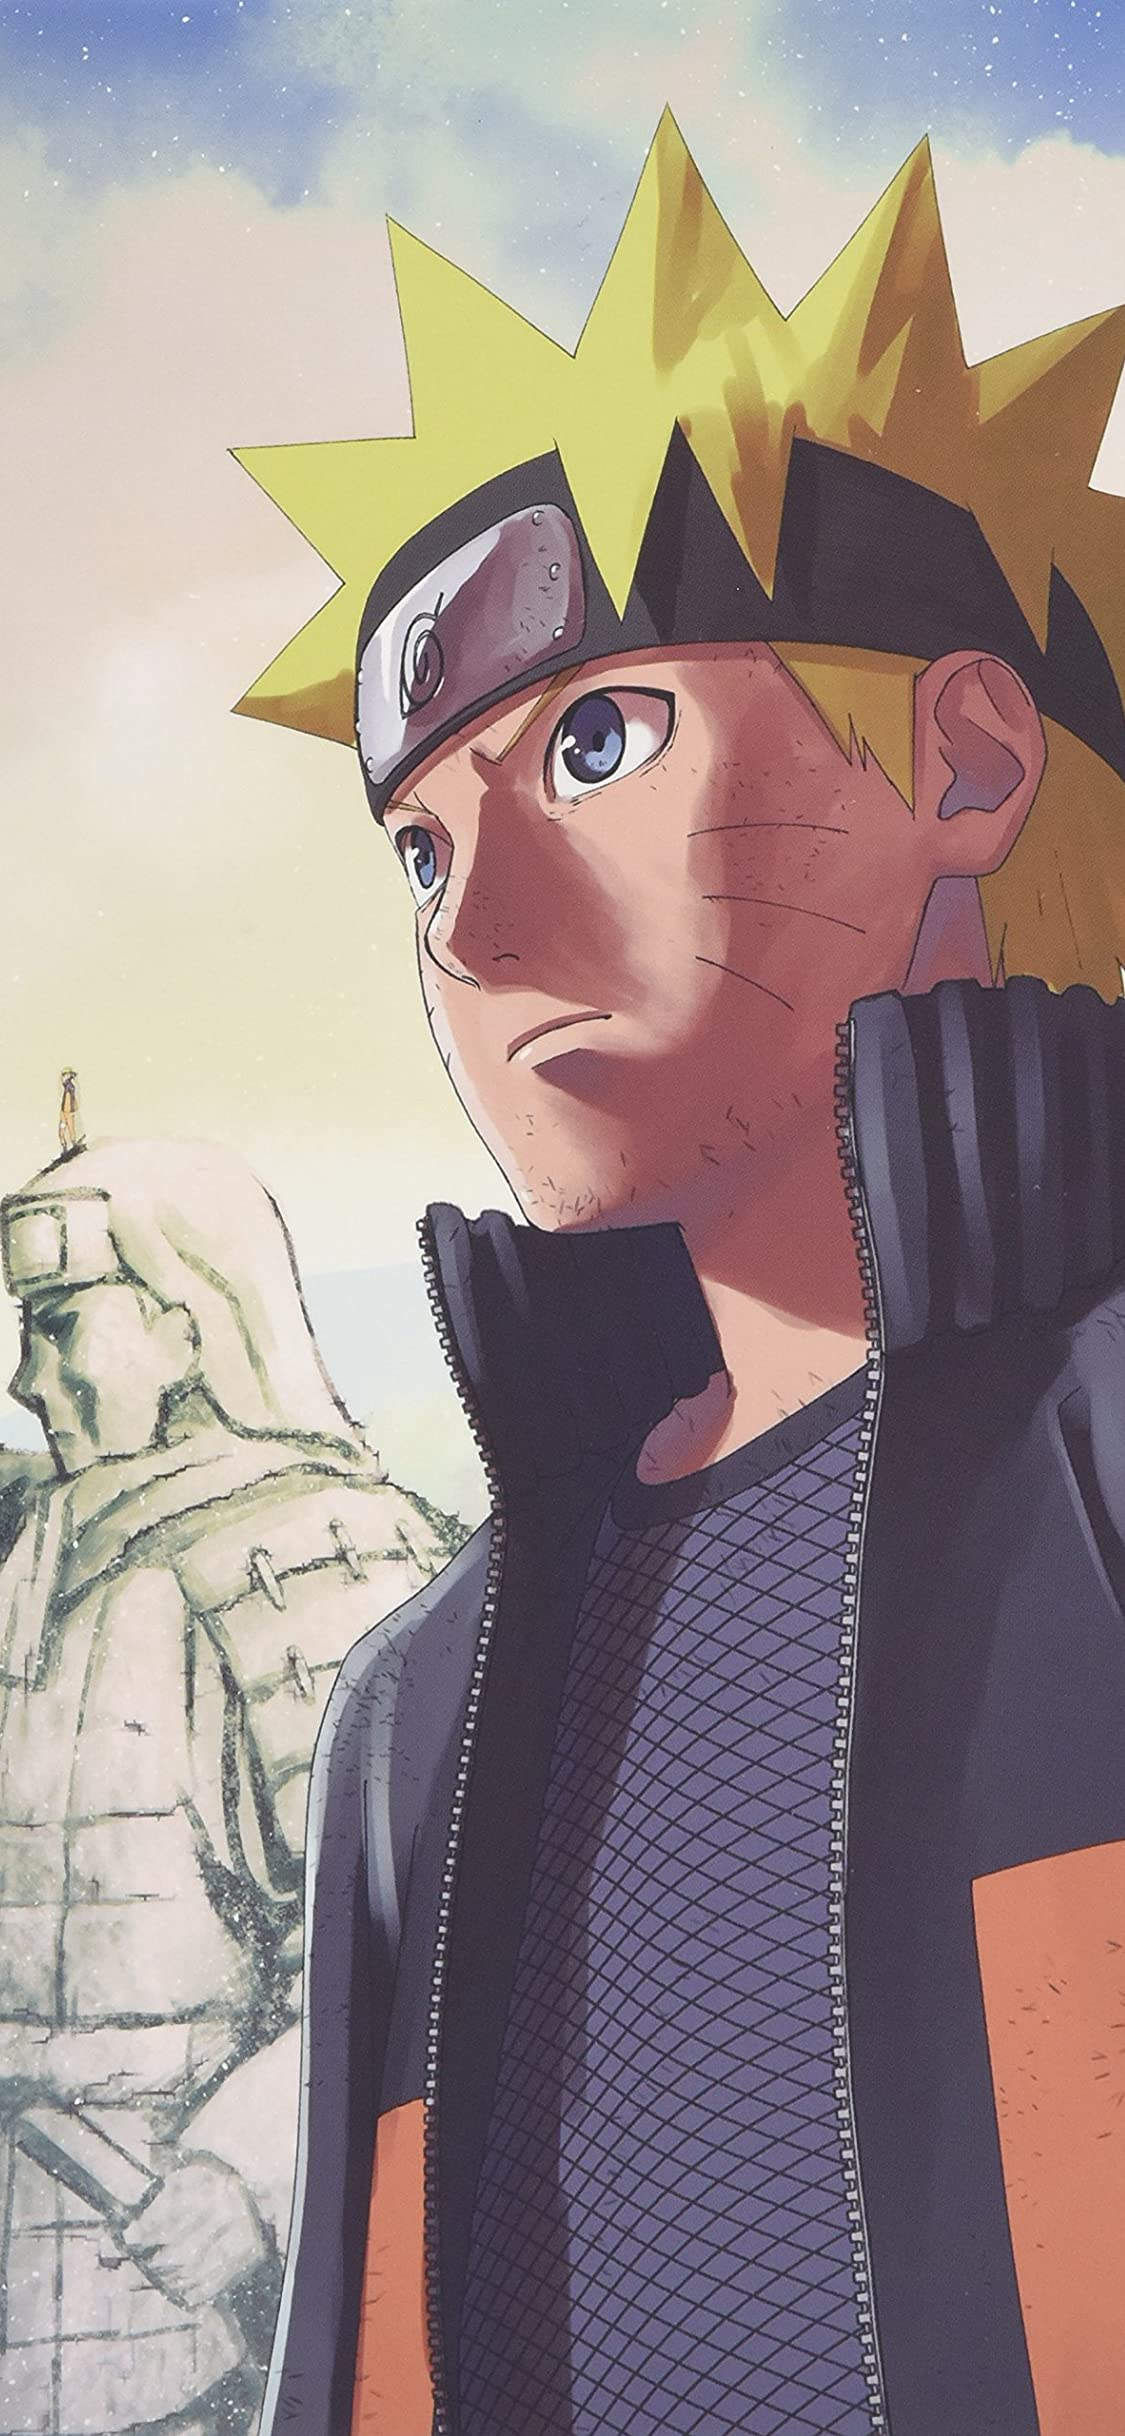 Naruto ナルト うずまきナルト Iphone X 壁紙 1125x2436 画像 スマポ